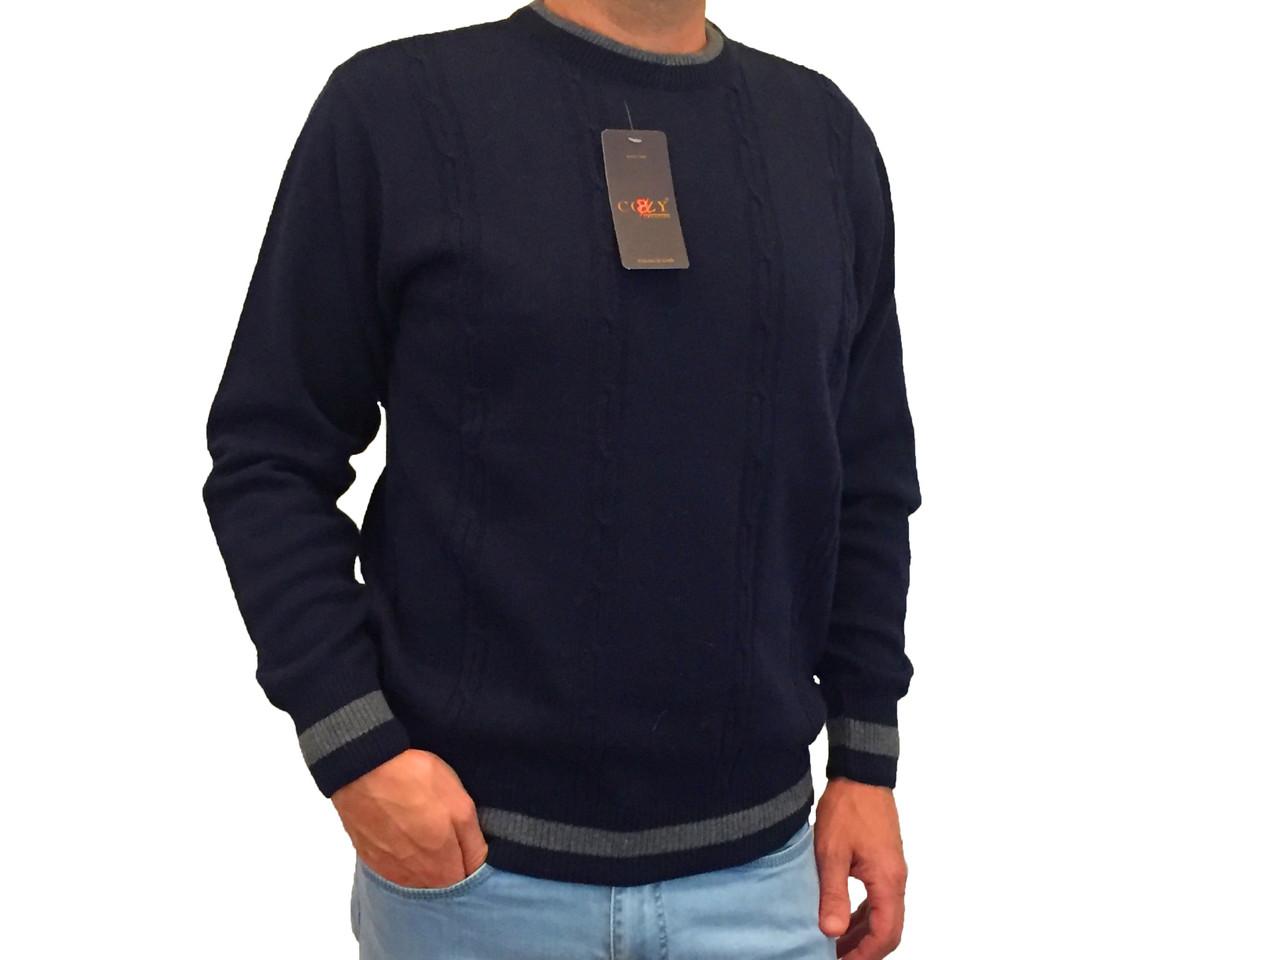 Мужской теплый свитер № 1620 синий с косичками